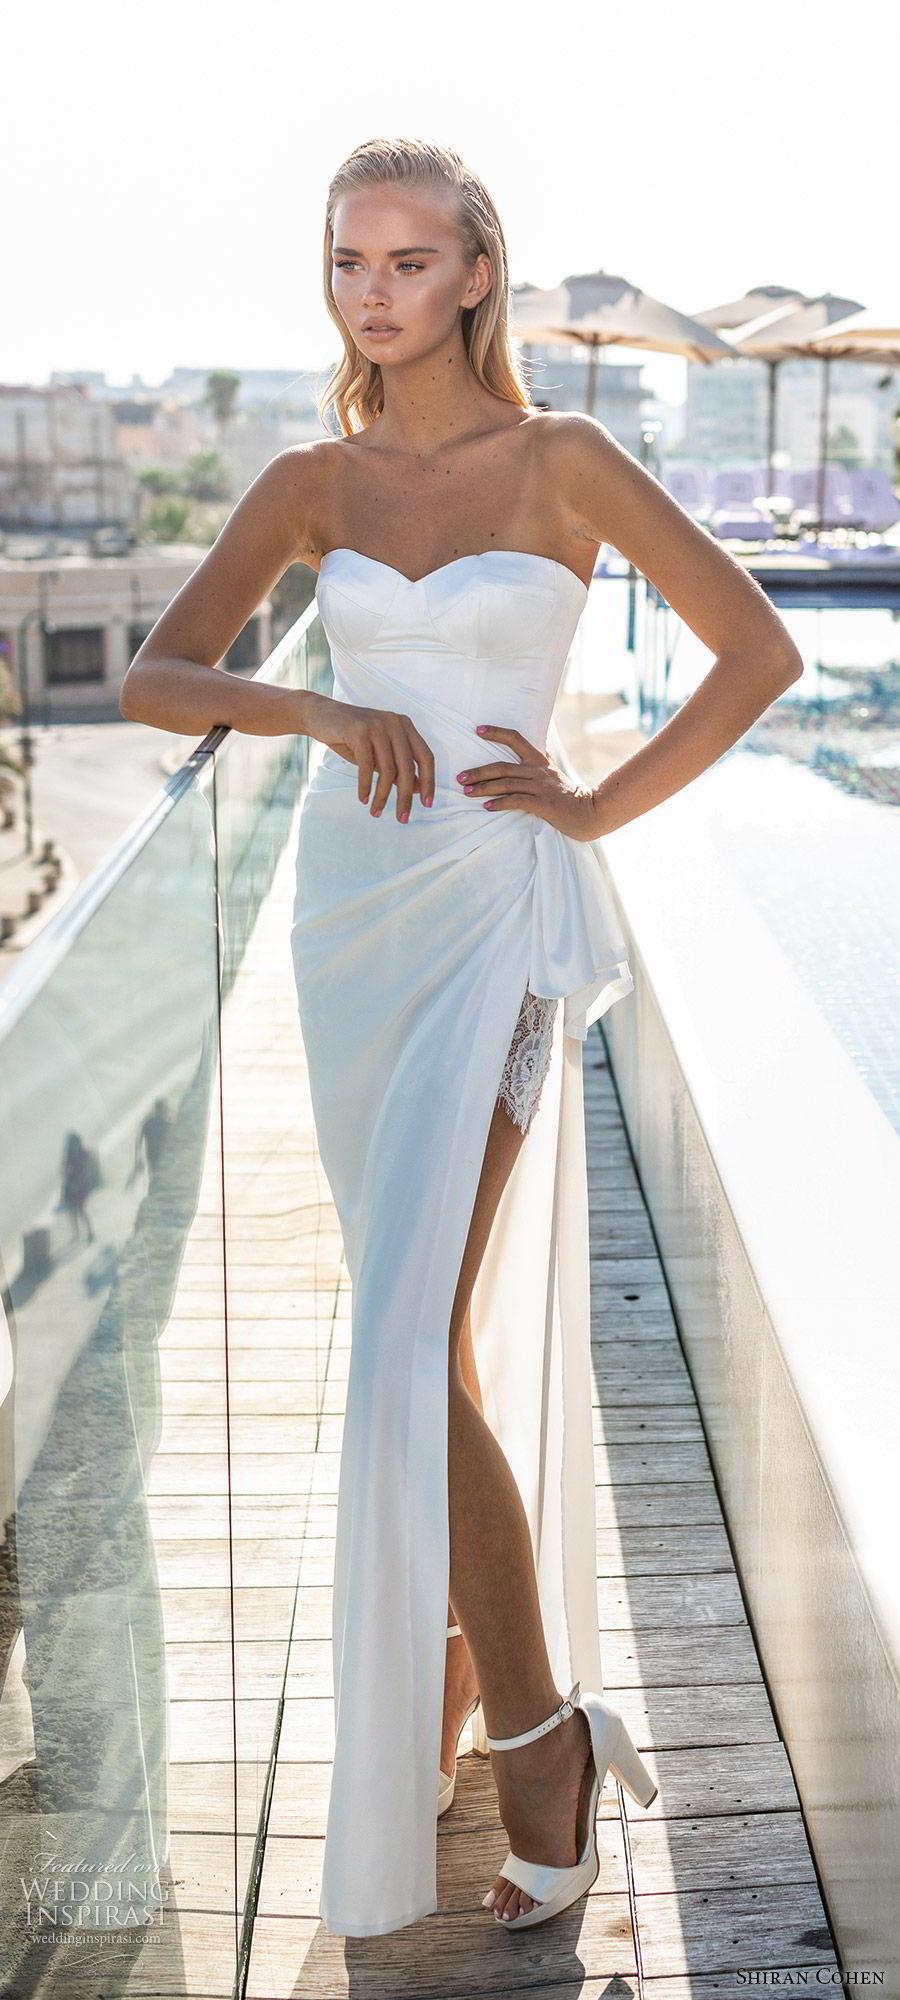 shiran cohen 2019 bridal strapless sweetheart minimally embellished sheath wedding dress side slit clean modern chic (4) lv